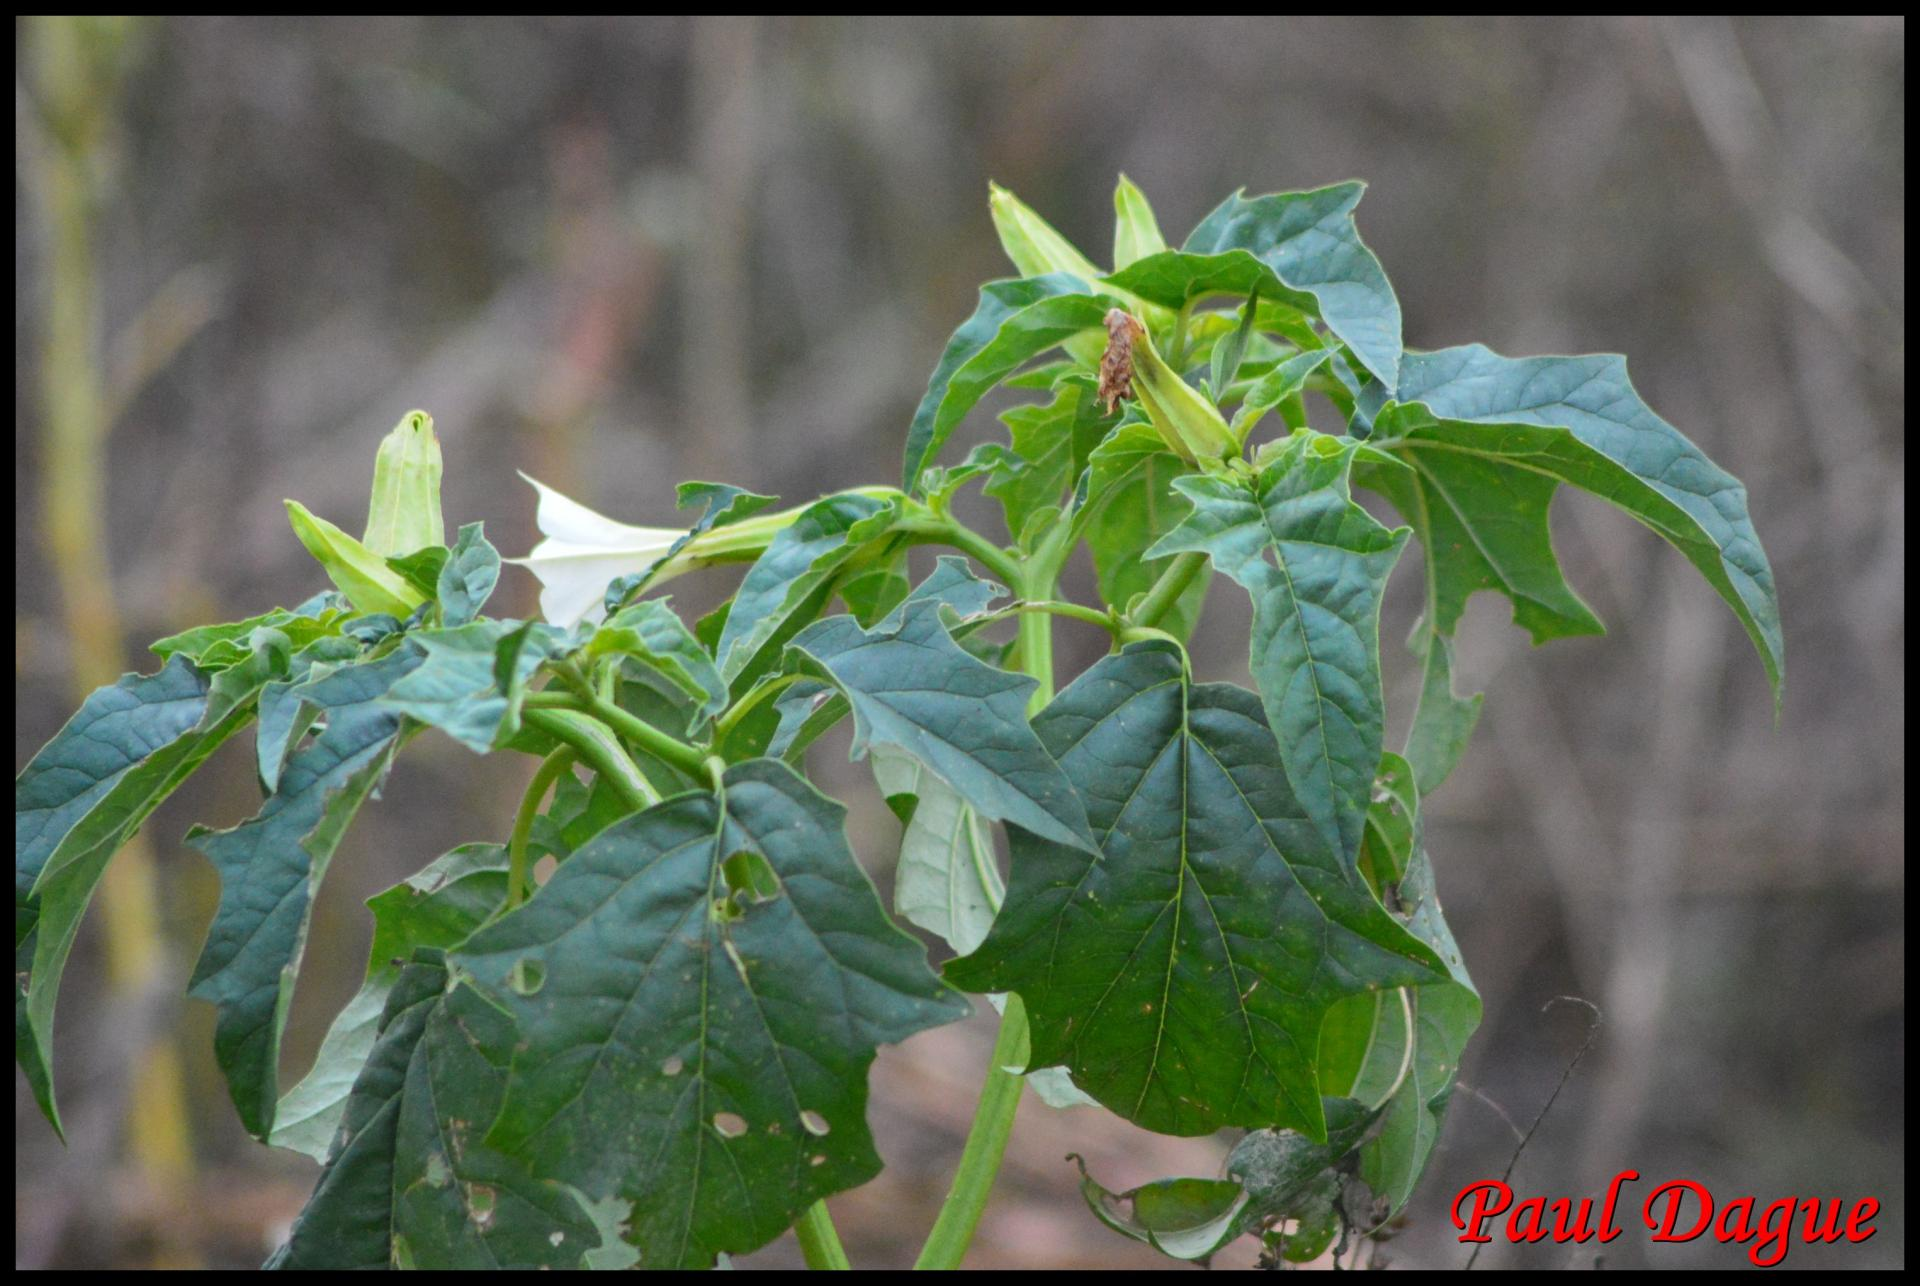 348 pomme epineuse datura stramonium solanaceae